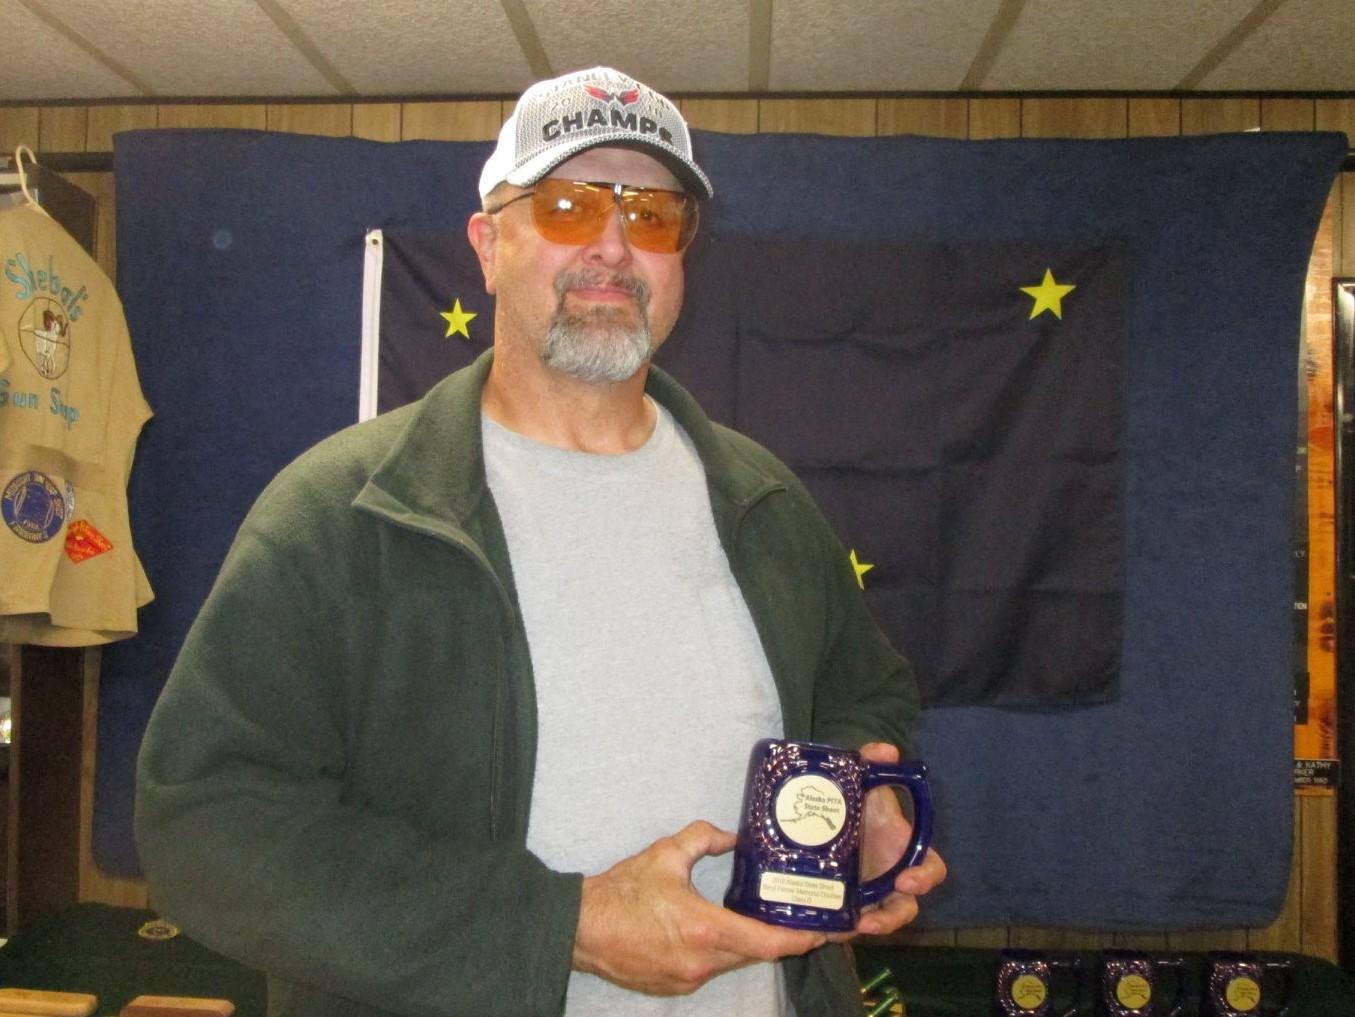 Jim Kurkowski wins D class doubles at AK State Shoot